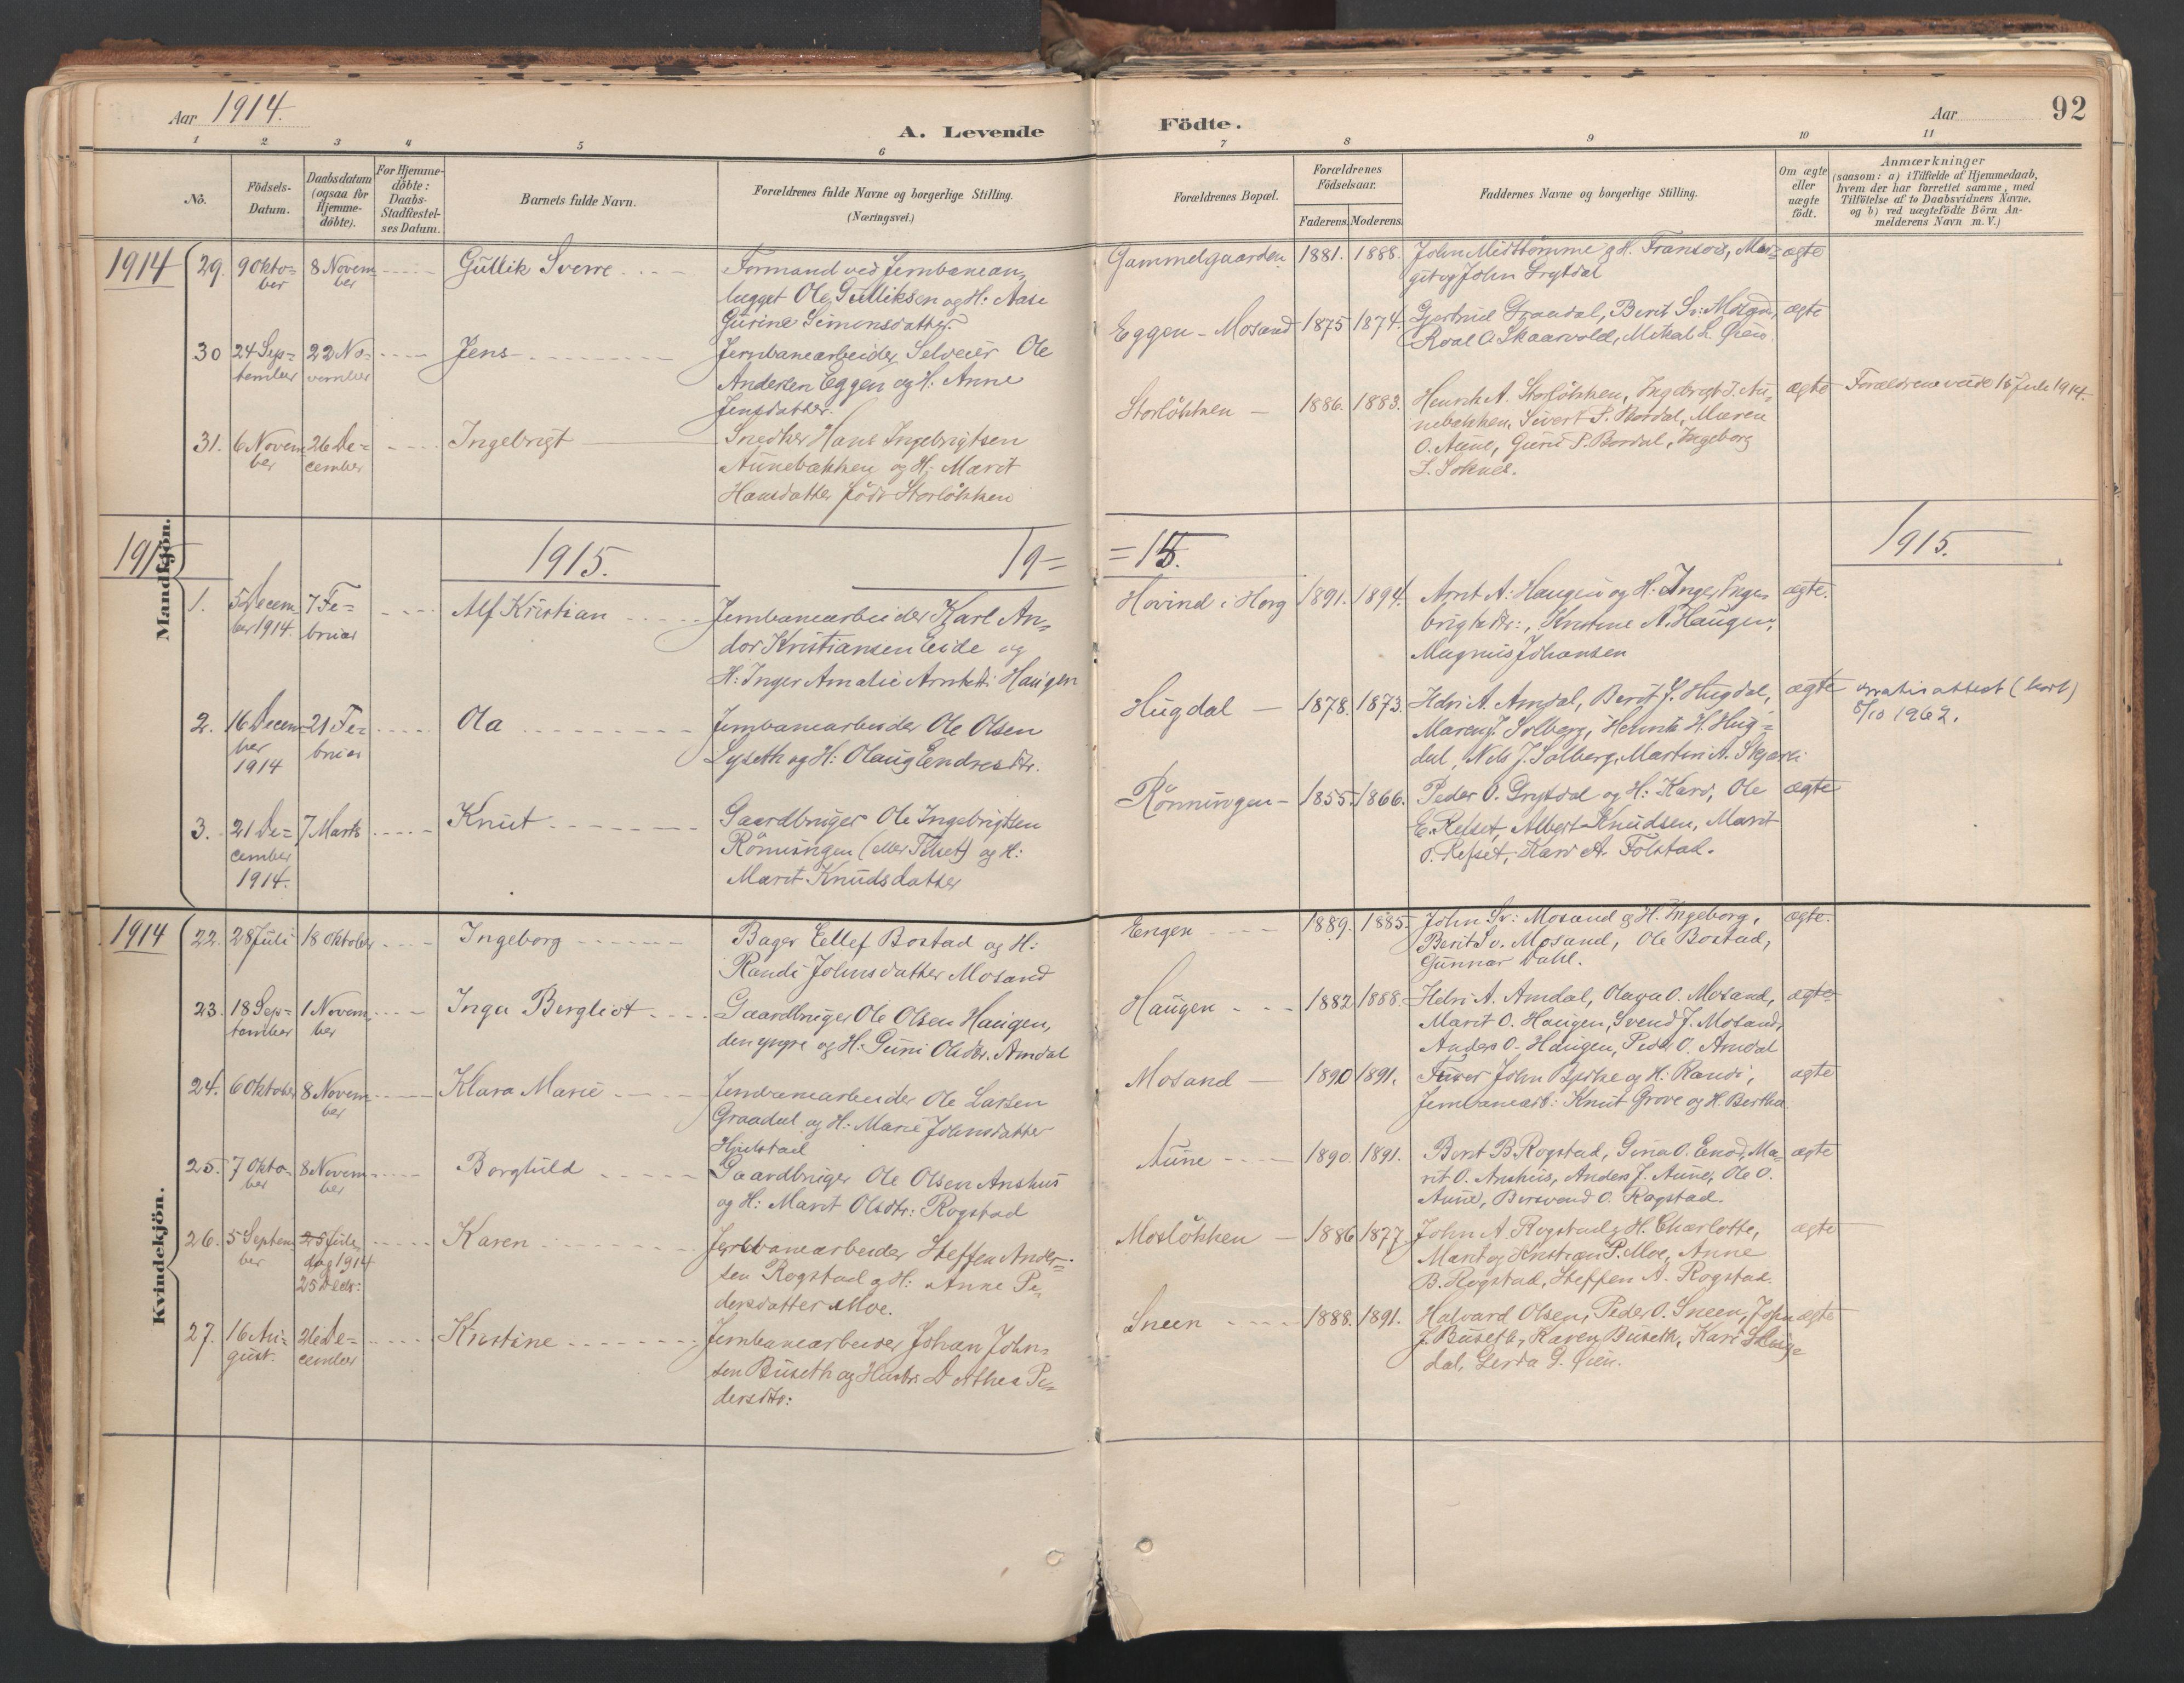 SAT, Ministerialprotokoller, klokkerbøker og fødselsregistre - Sør-Trøndelag, 687/L1004: Parish register (official) no. 687A10, 1891-1923, p. 92